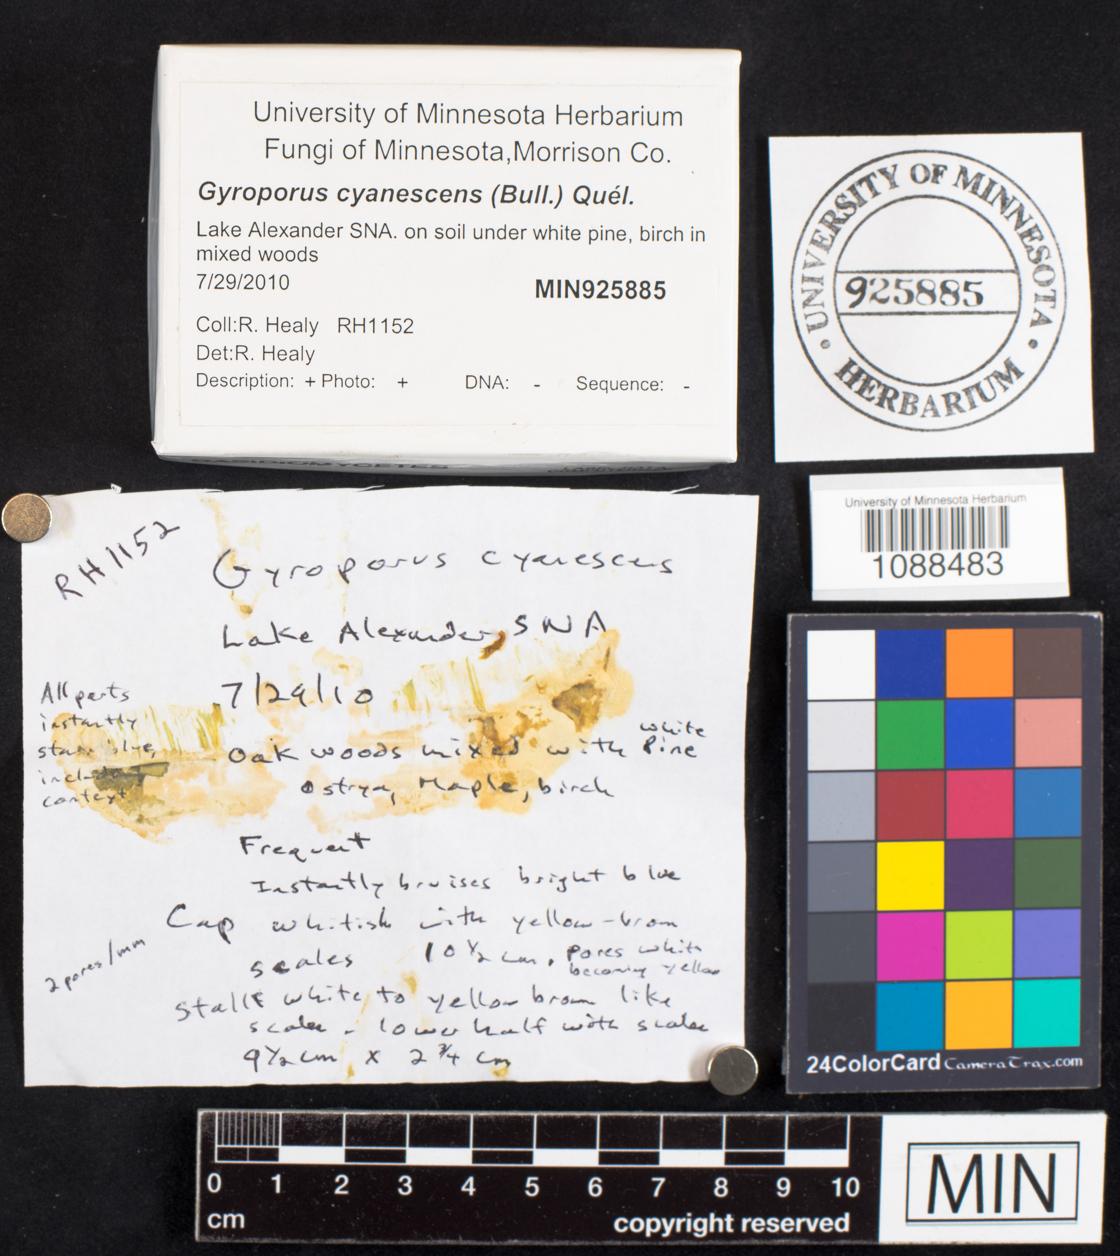 Gyroporus cyanescens image